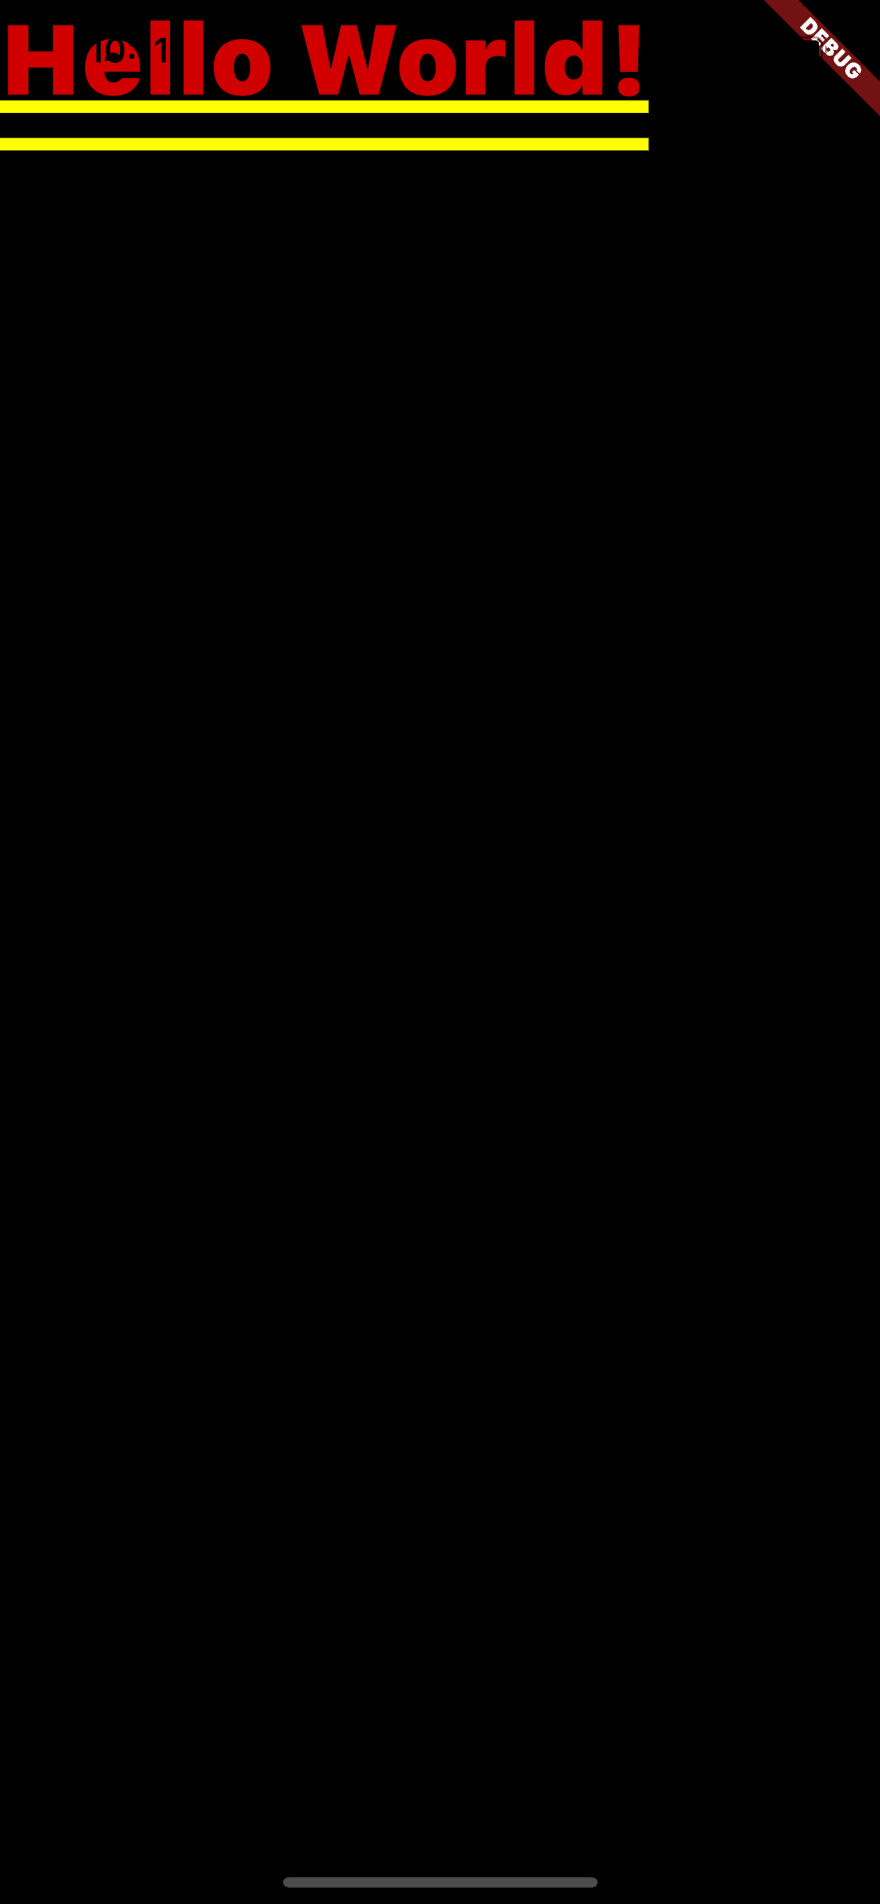 Simulator Screen Shot - iPhone 12 Pro Max - 2020-12-09 at 22.11.51.png